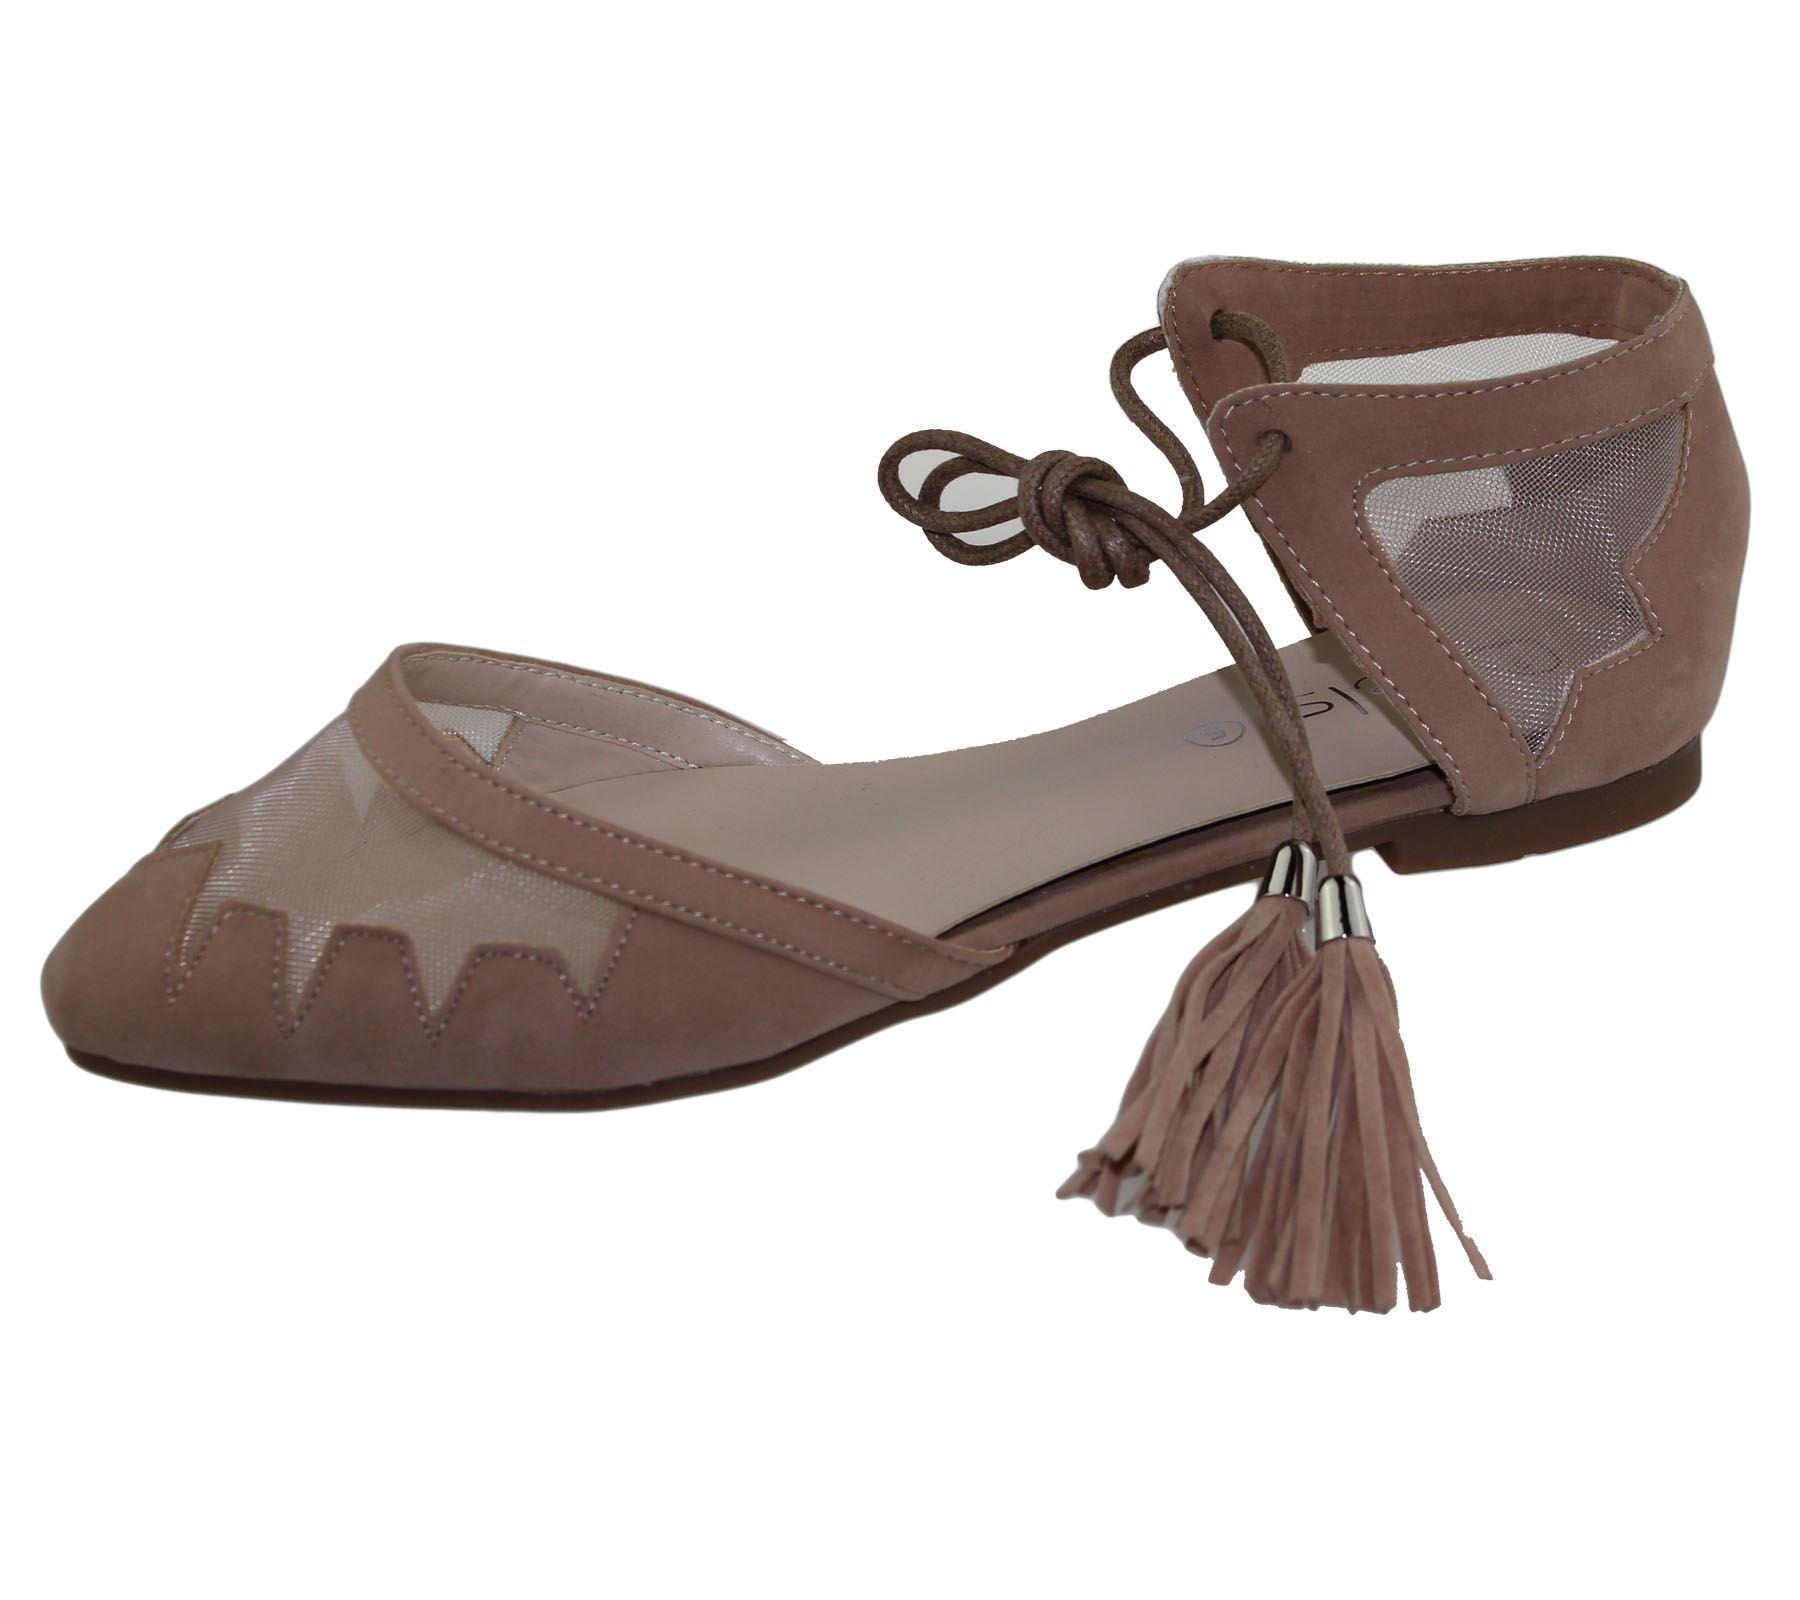 Womens-Flat-Ballerina-Dolly-Pumps-Ballet-Ladies-Summer-Mesh-Tassel-Shoes-Sandals thumbnail 23